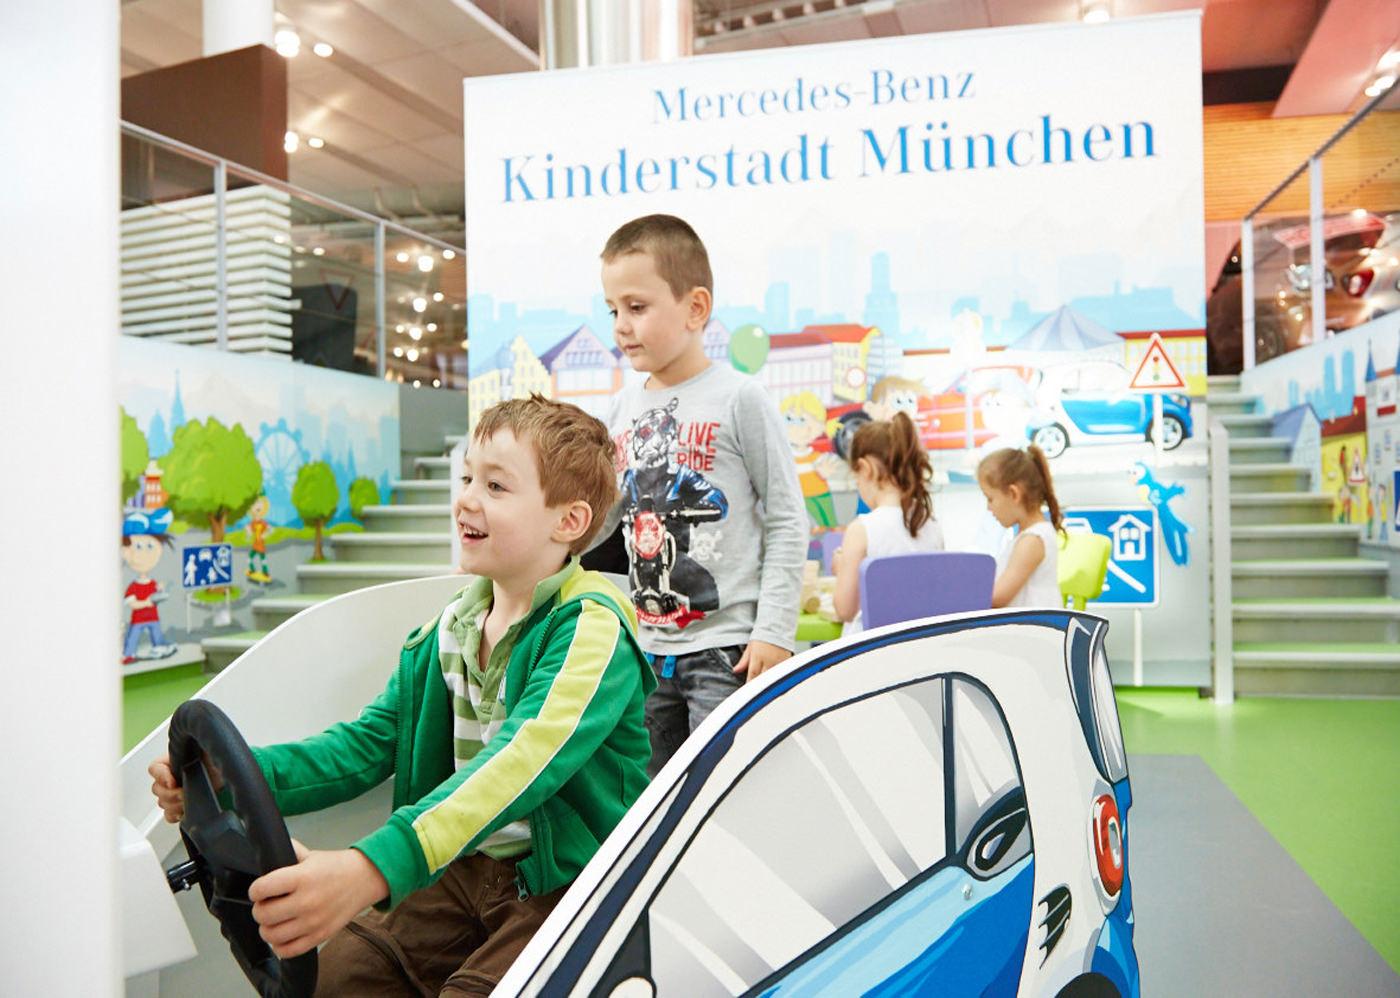 Ravensburger Marken Erlebniswelt - Mercedes Benz Kinderstadt München